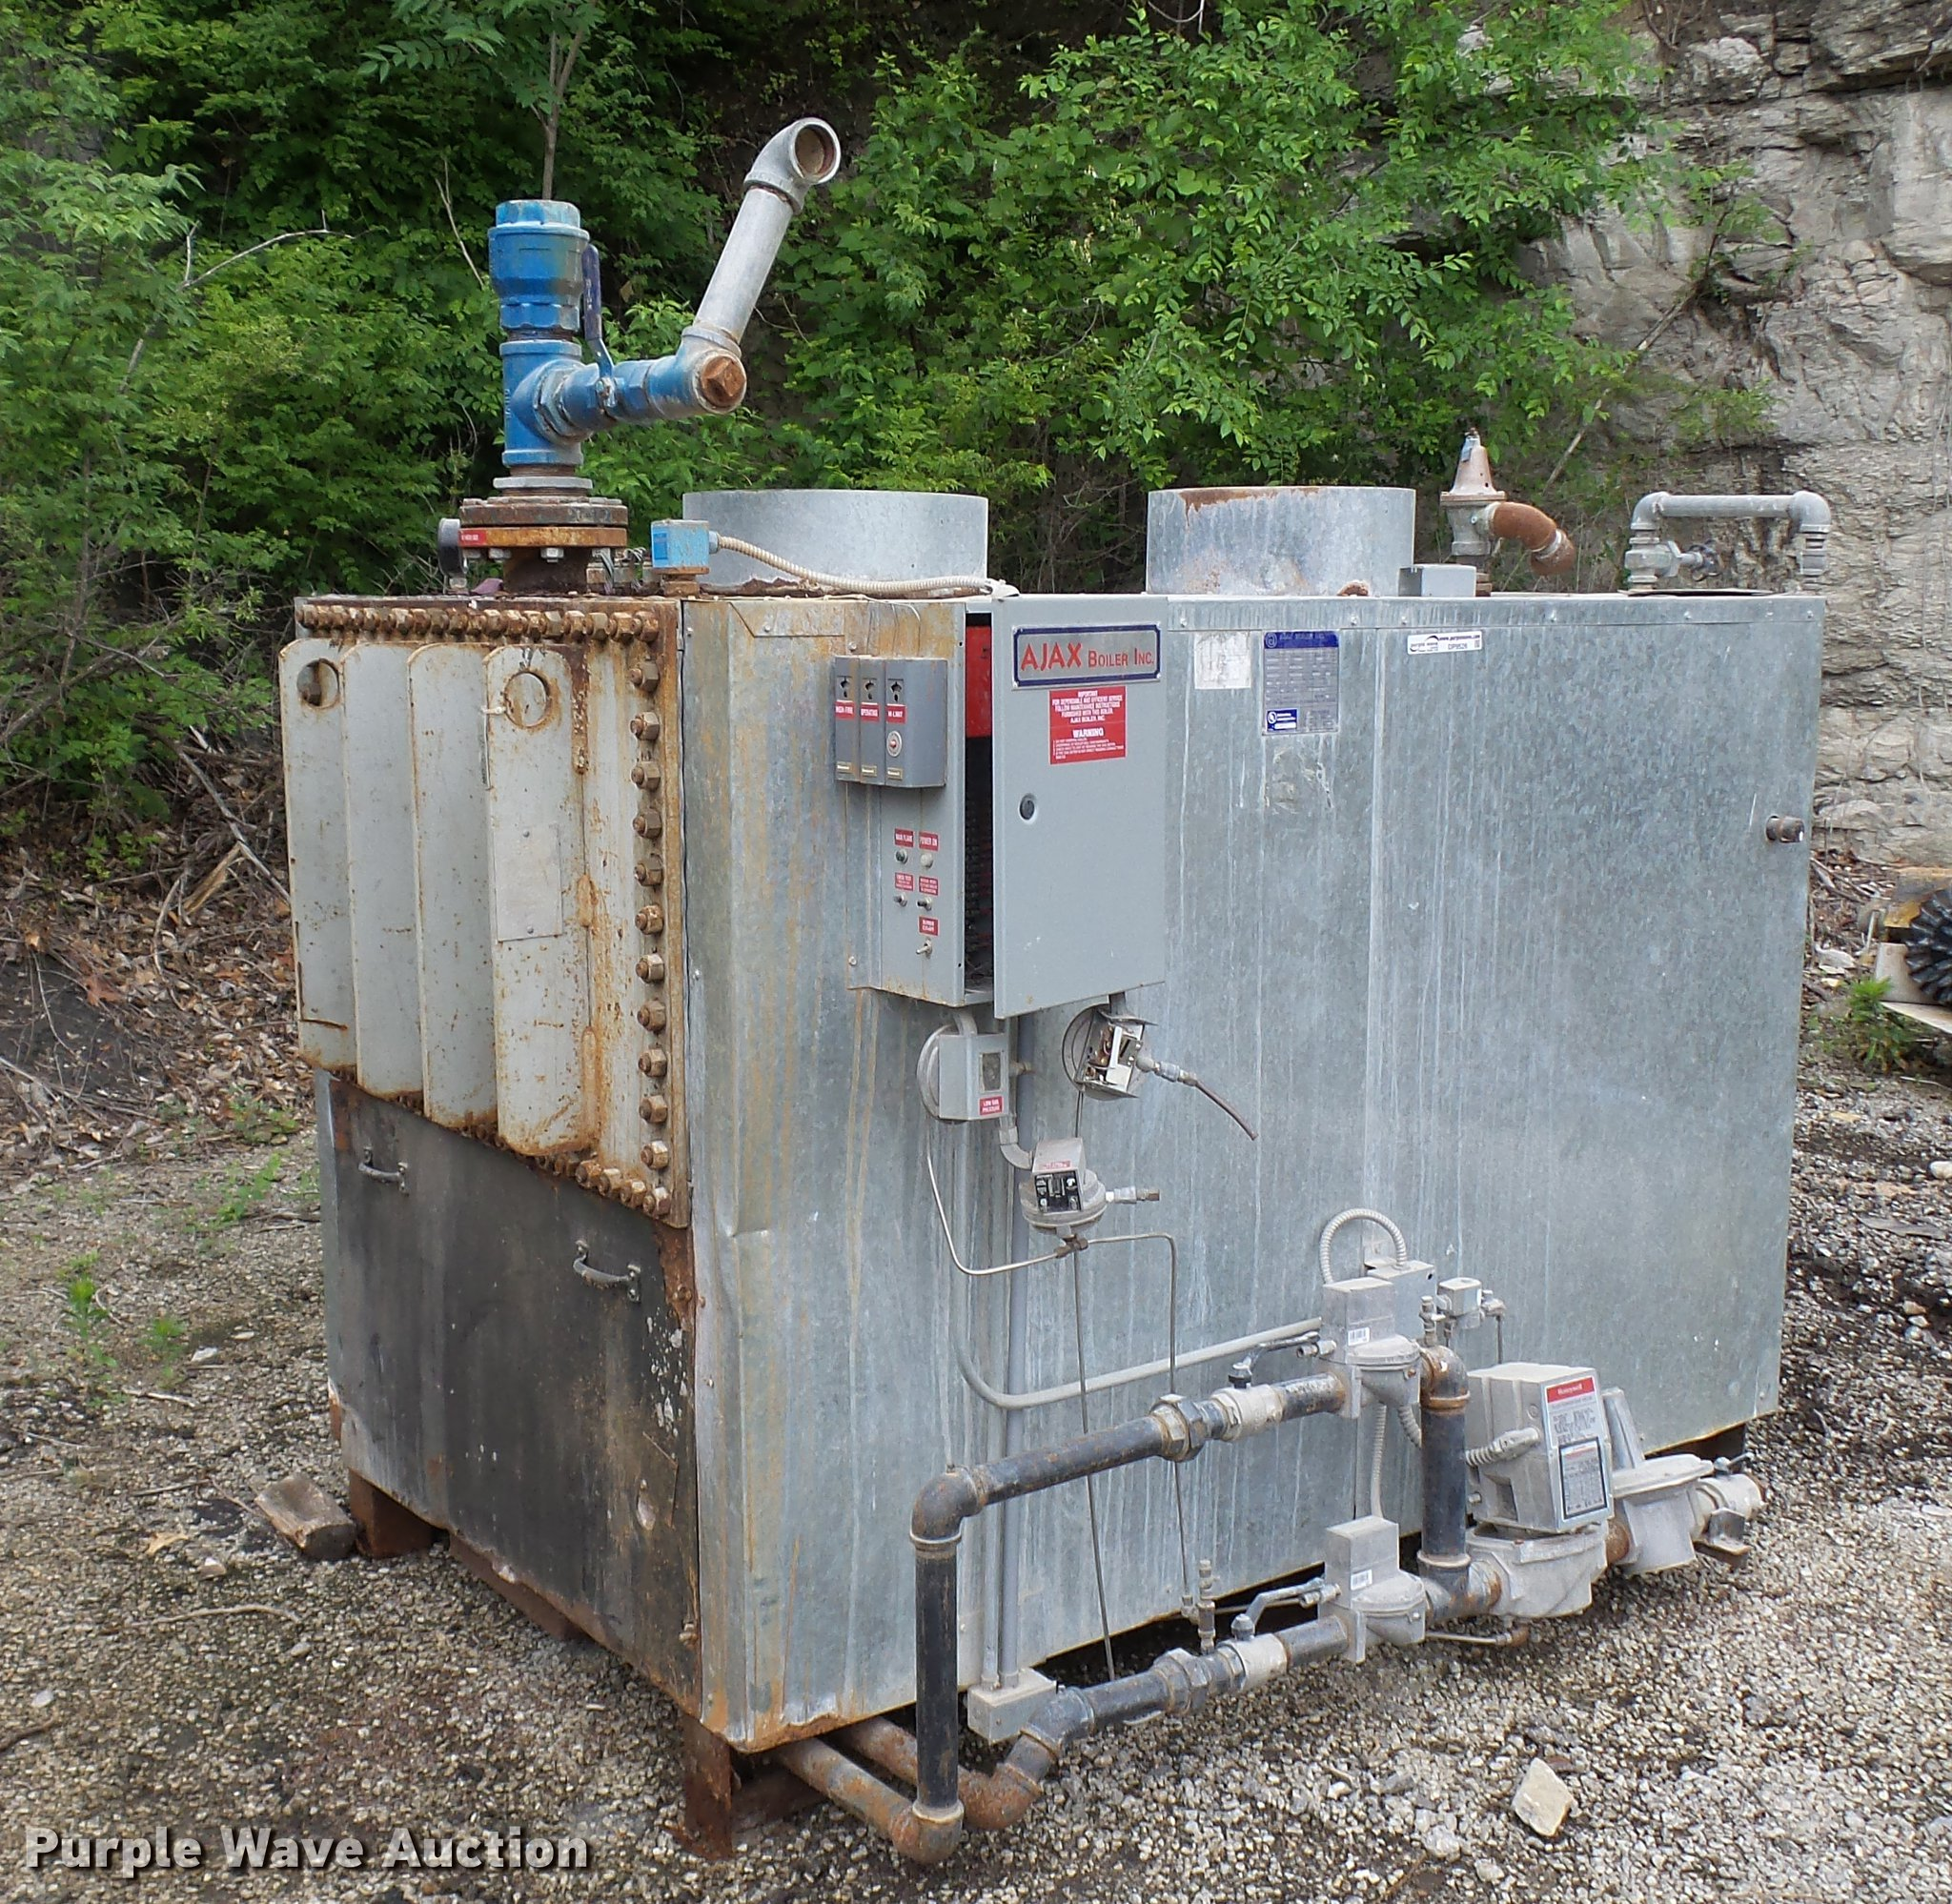 Ajax WNG3500 boiler   Item DP9526   SOLD! June 27 Vehicles a... on